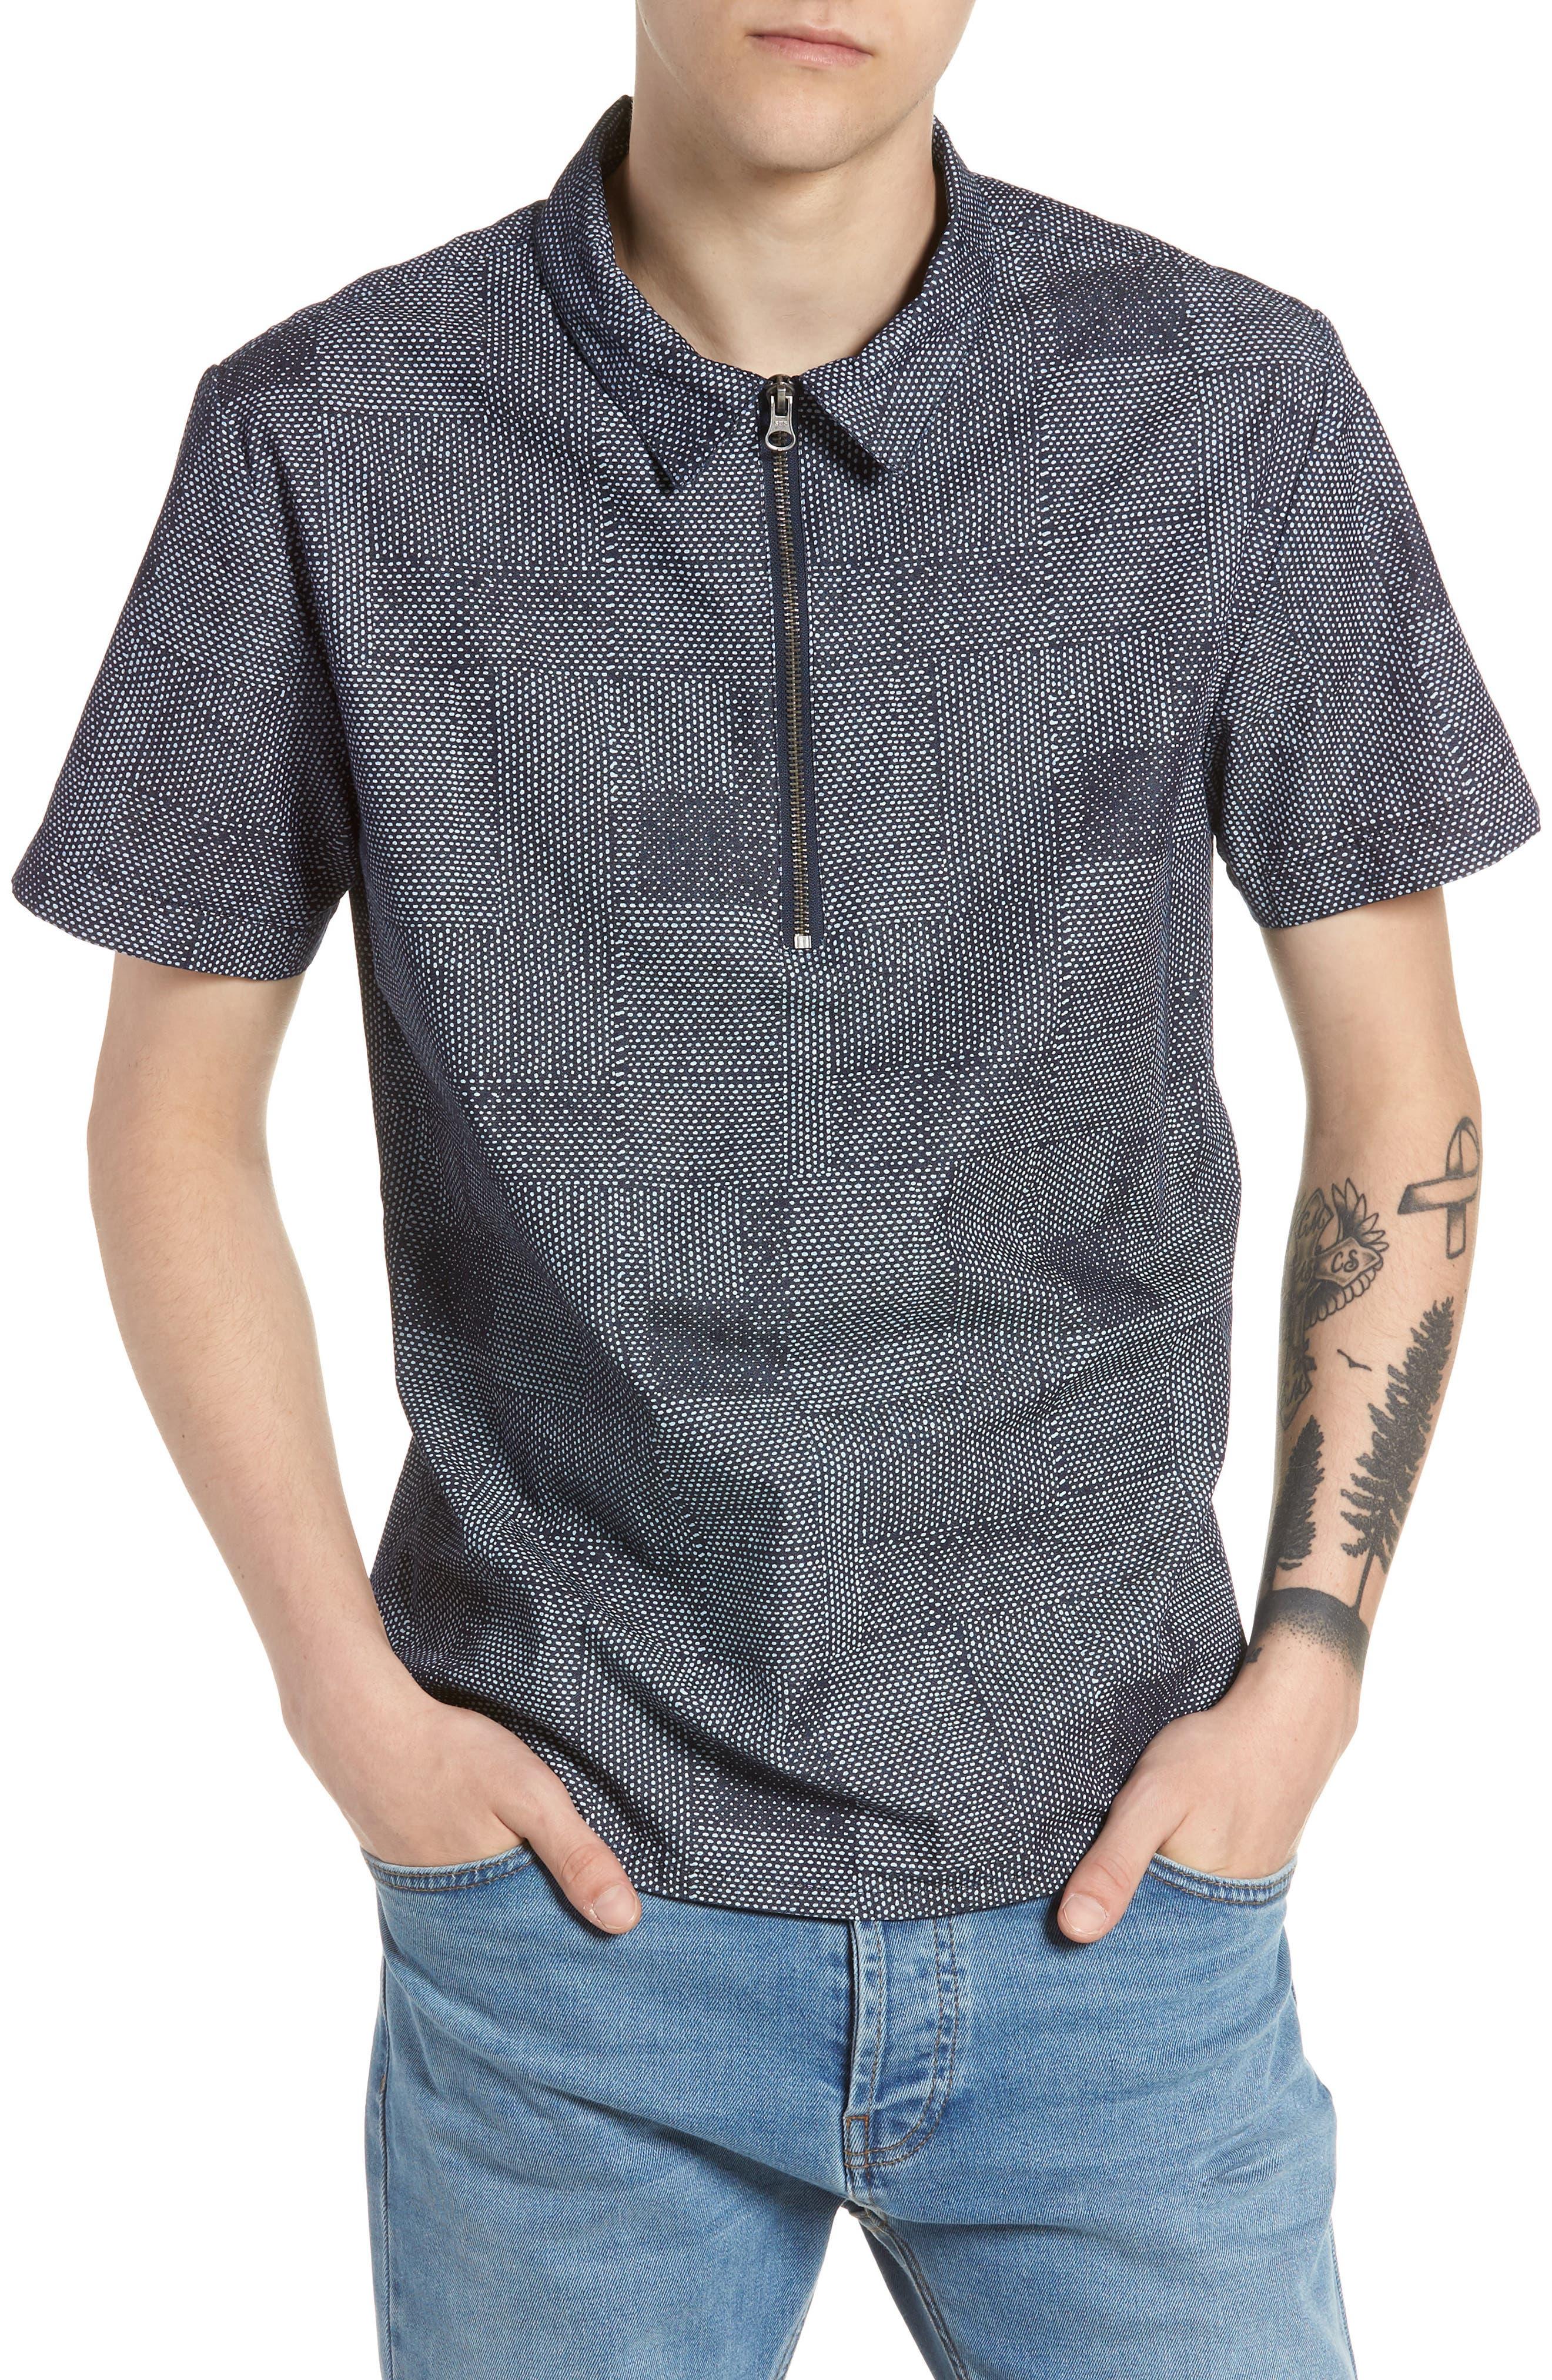 Dotpatch Woven Shirt,                             Main thumbnail 1, color,                             Indigo